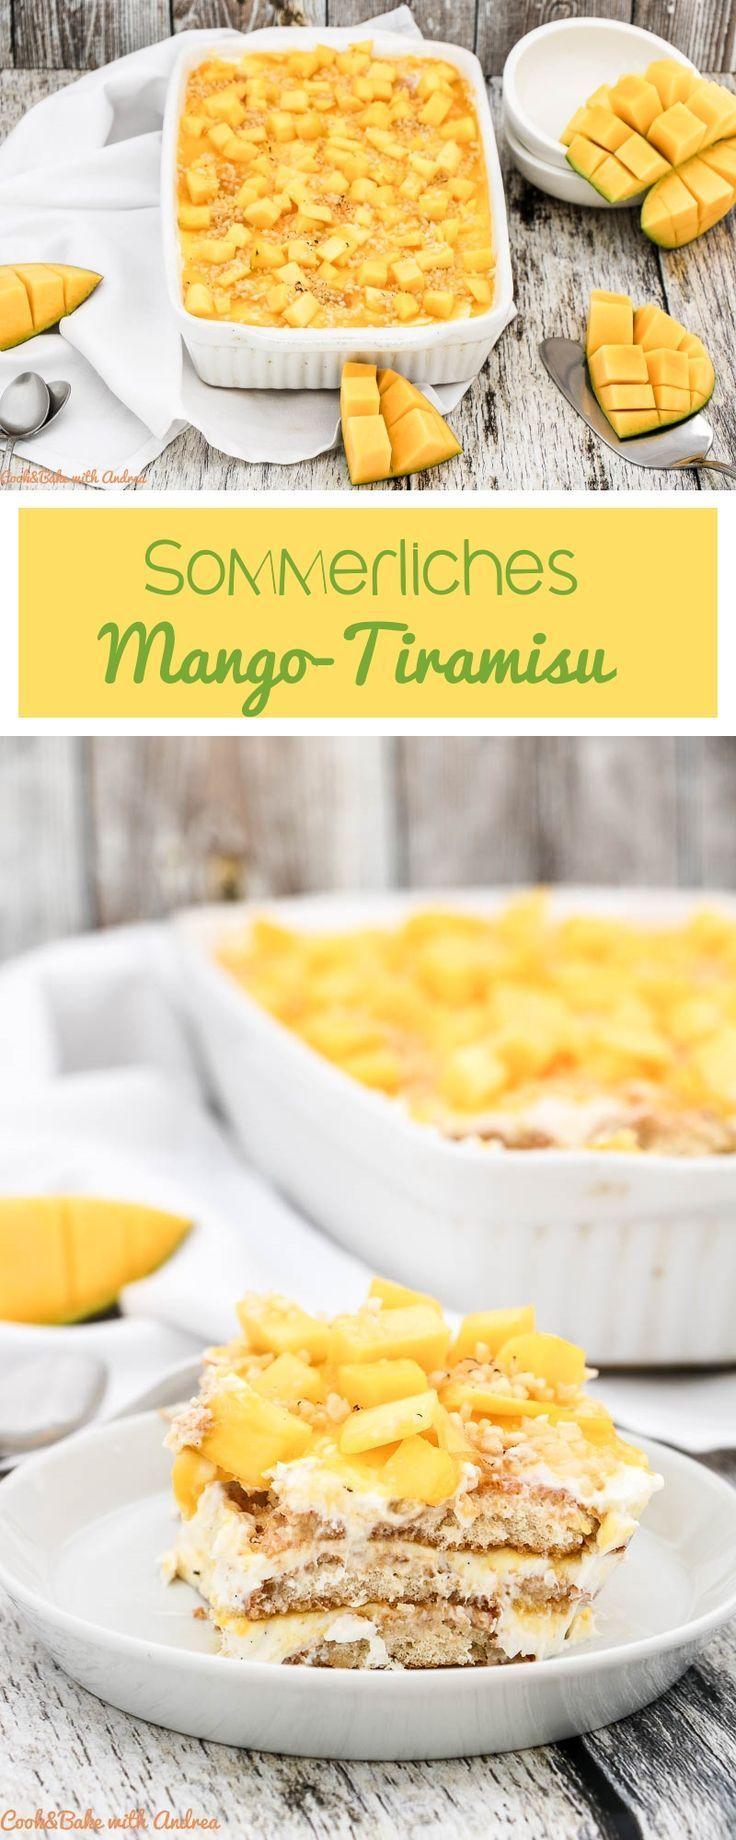 Sommerliches Mango-Tiramisu mit Zitrone